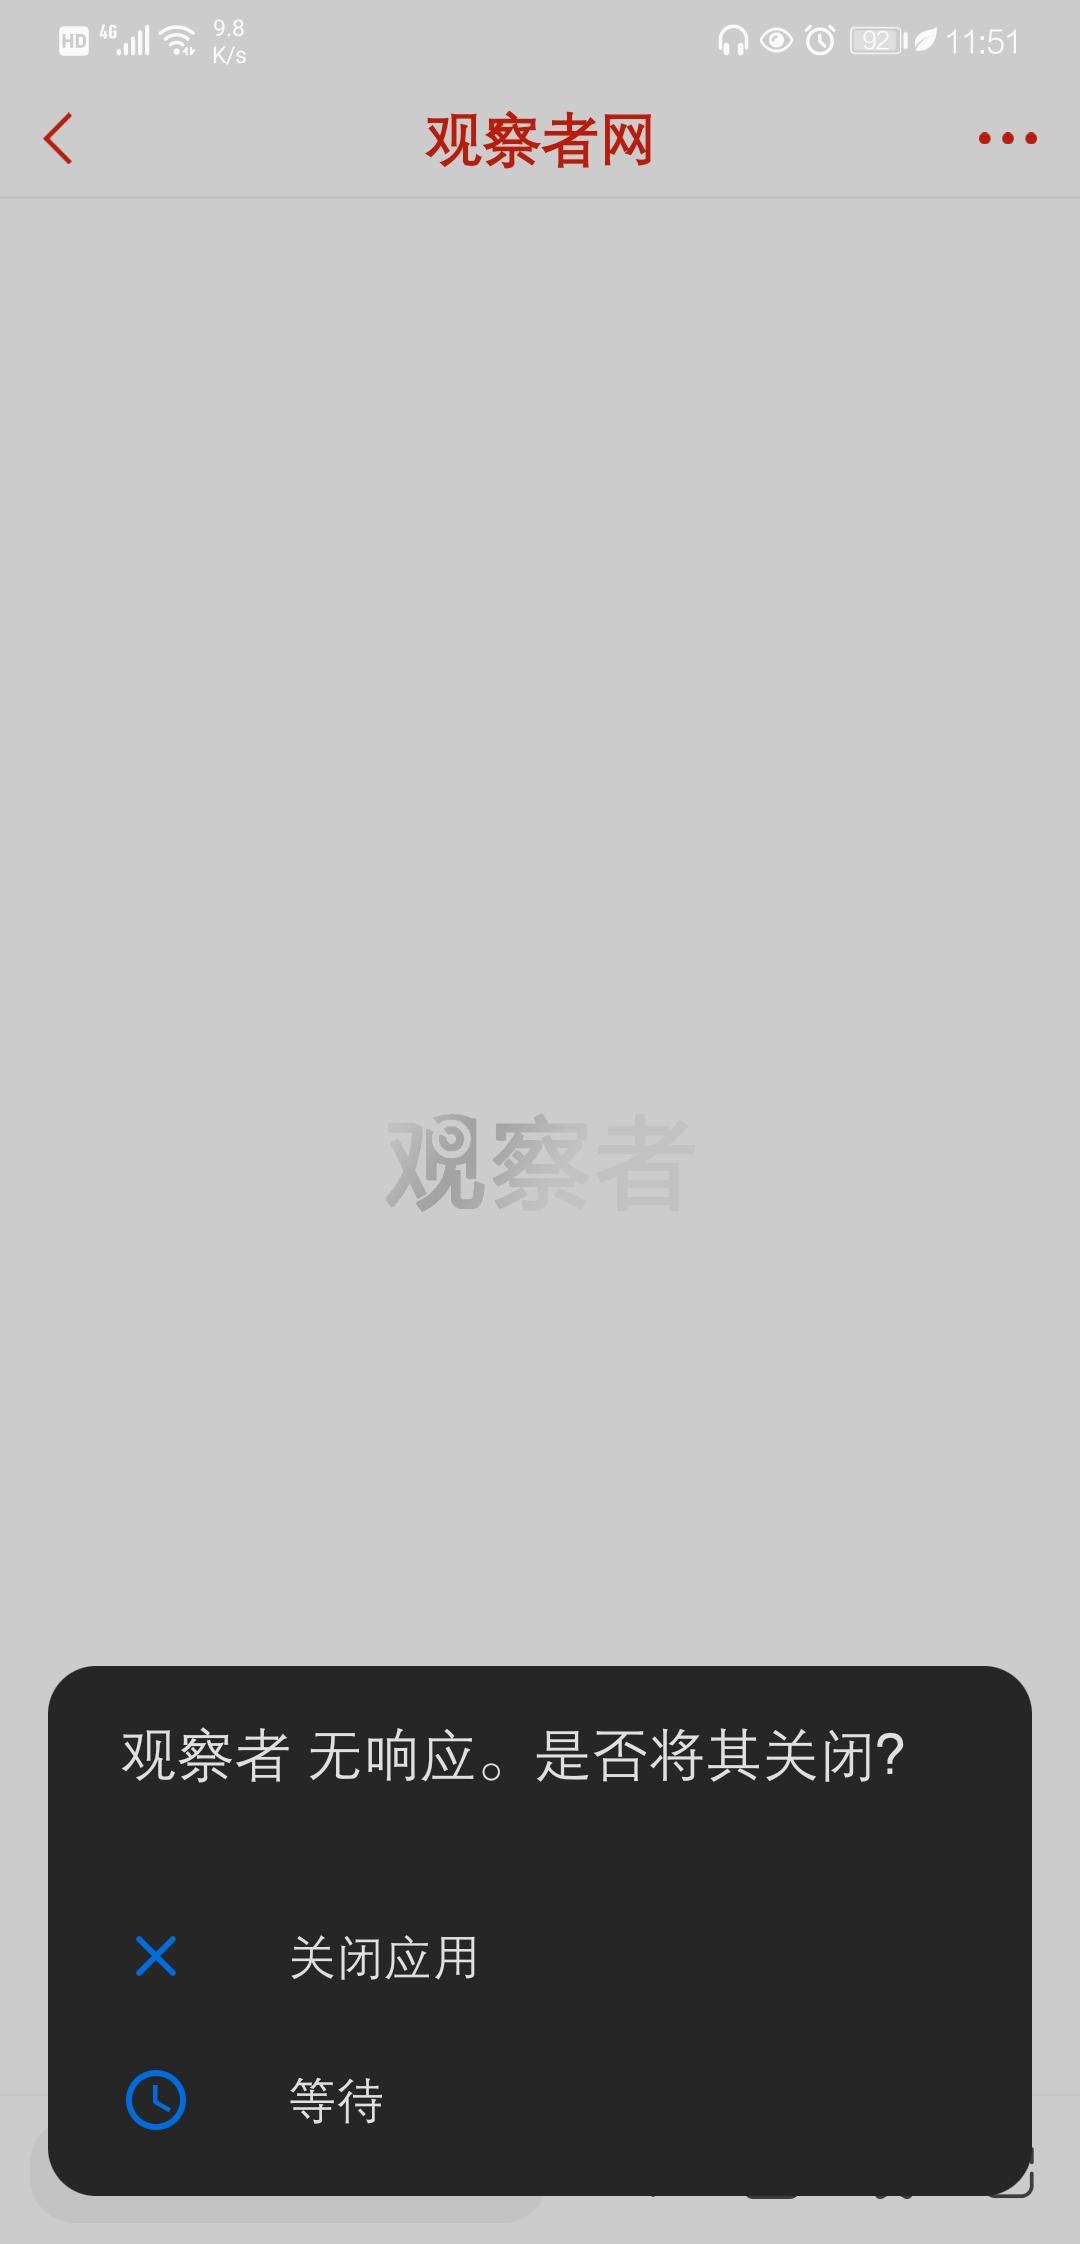 Screenshot_20201229_235155_cn.guancha.app.jpg